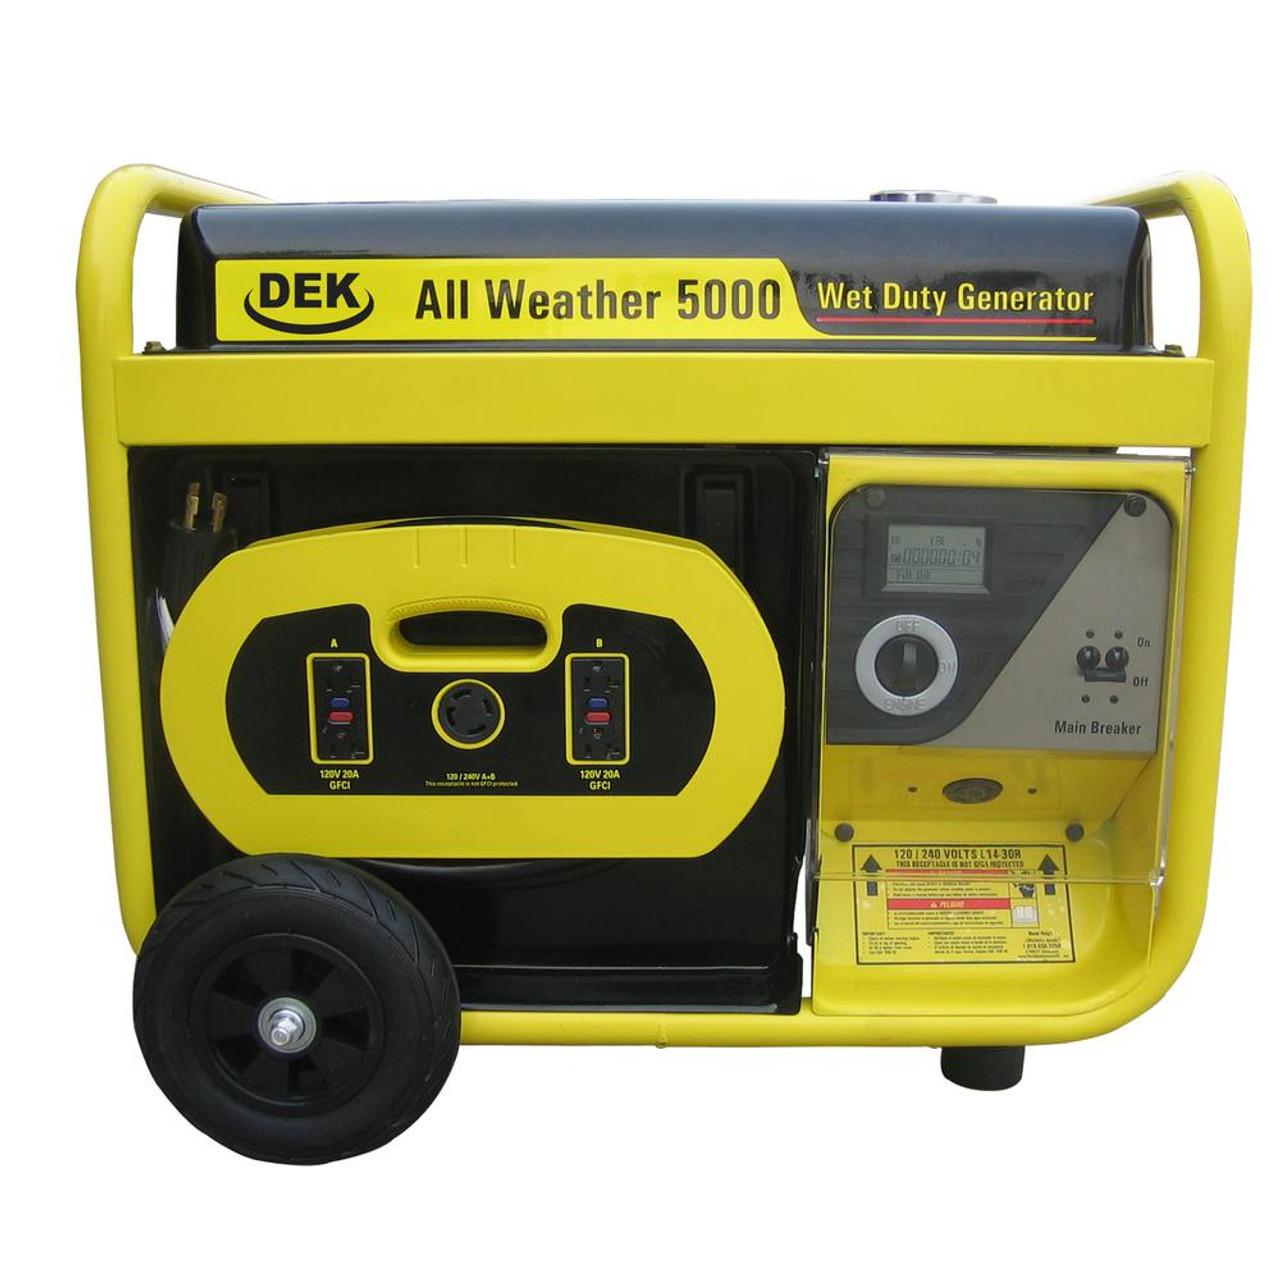 Best Portable Generators 6600 Watts Electric Start Generator Beast Watt Surge All Weather Removable Control Panel